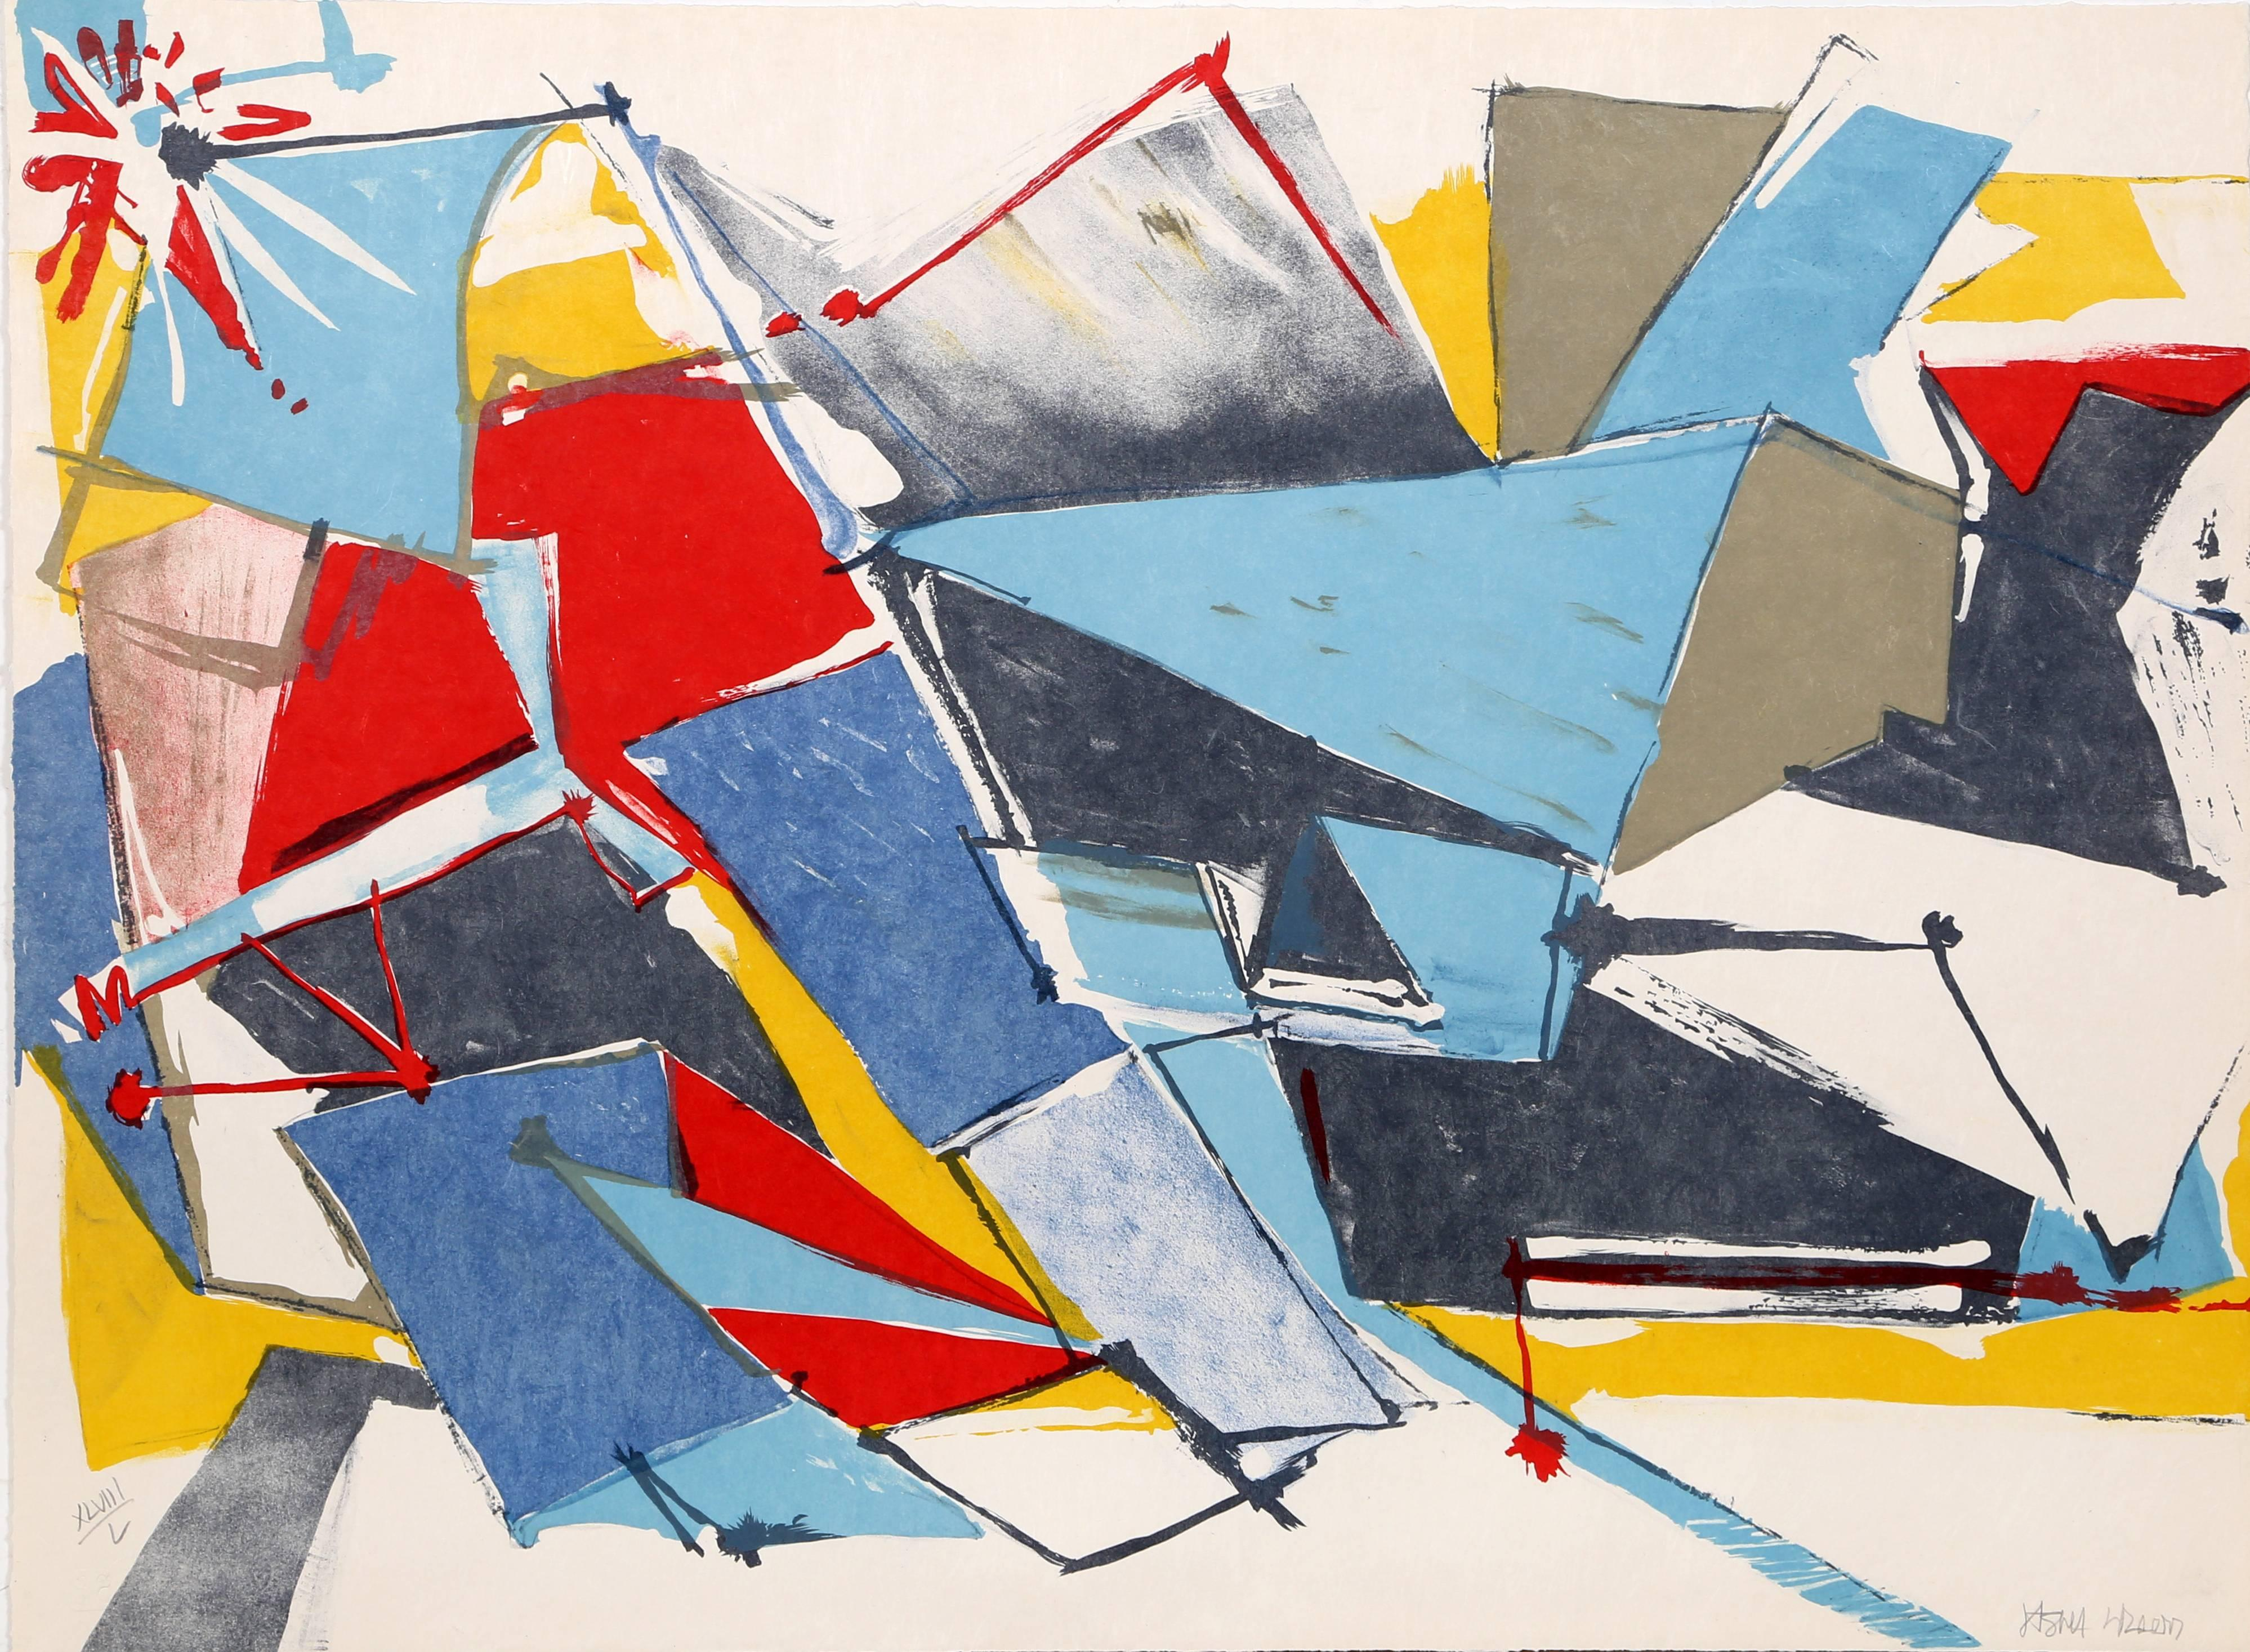 Bright Abstract Print by Jasha Green